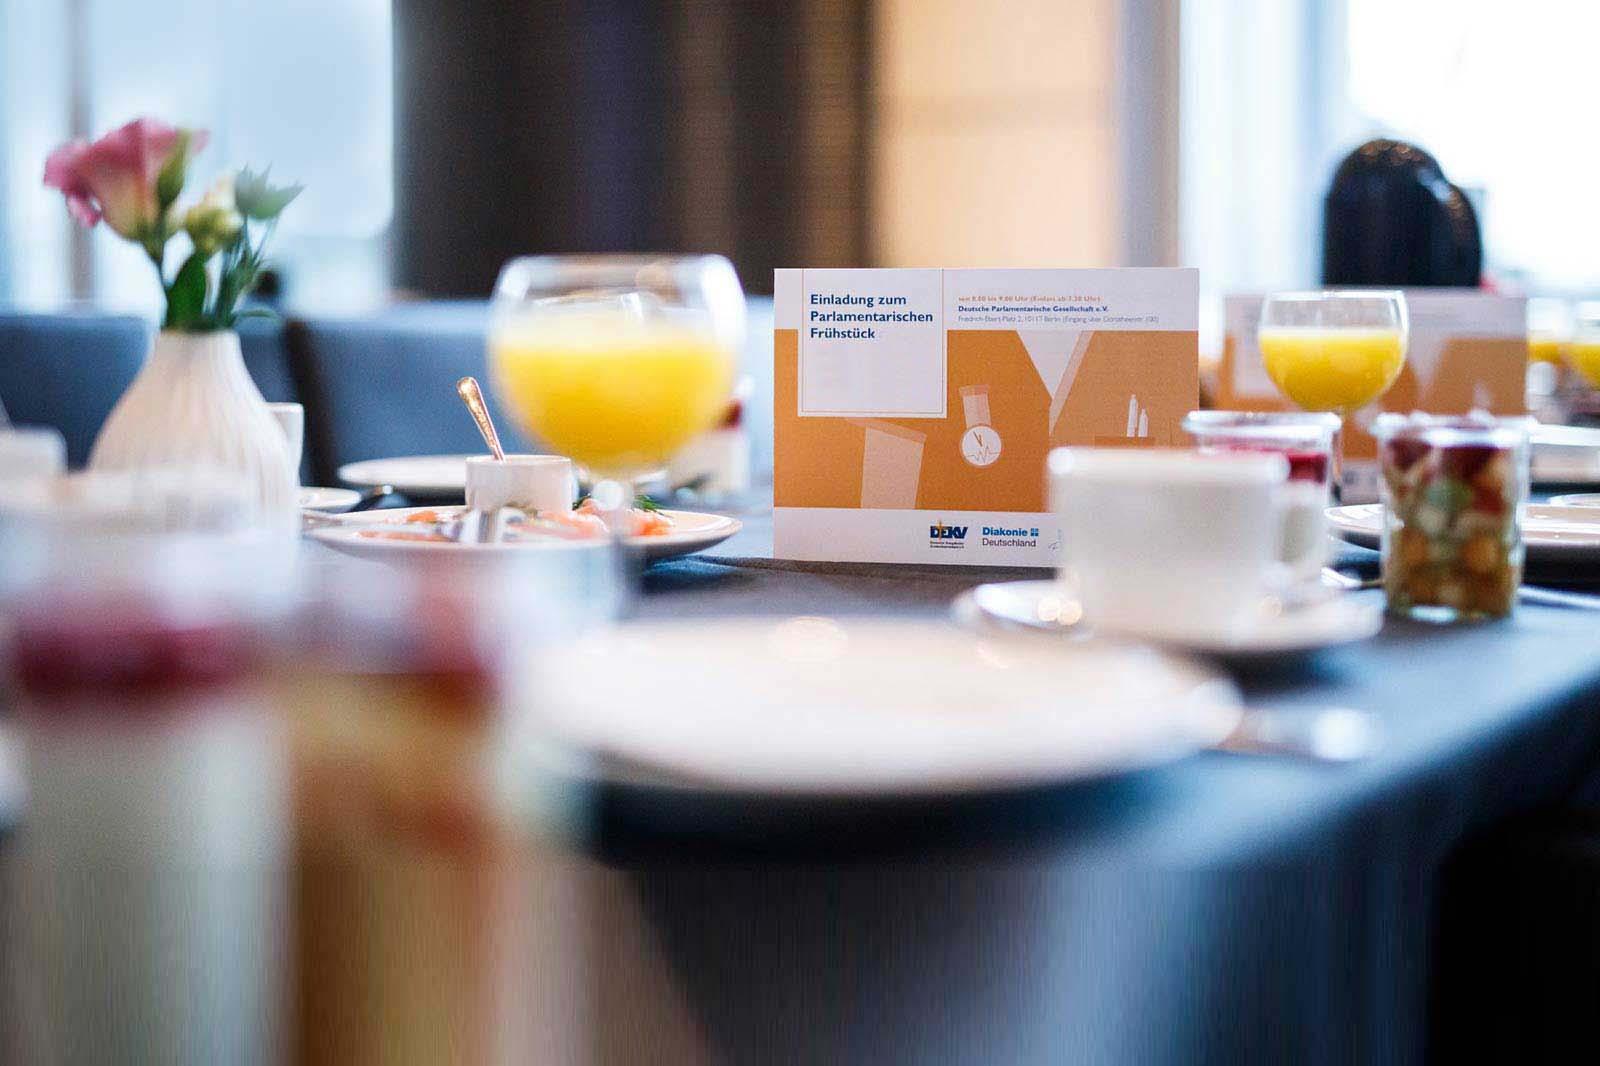 Parlamentarisches Frühstück